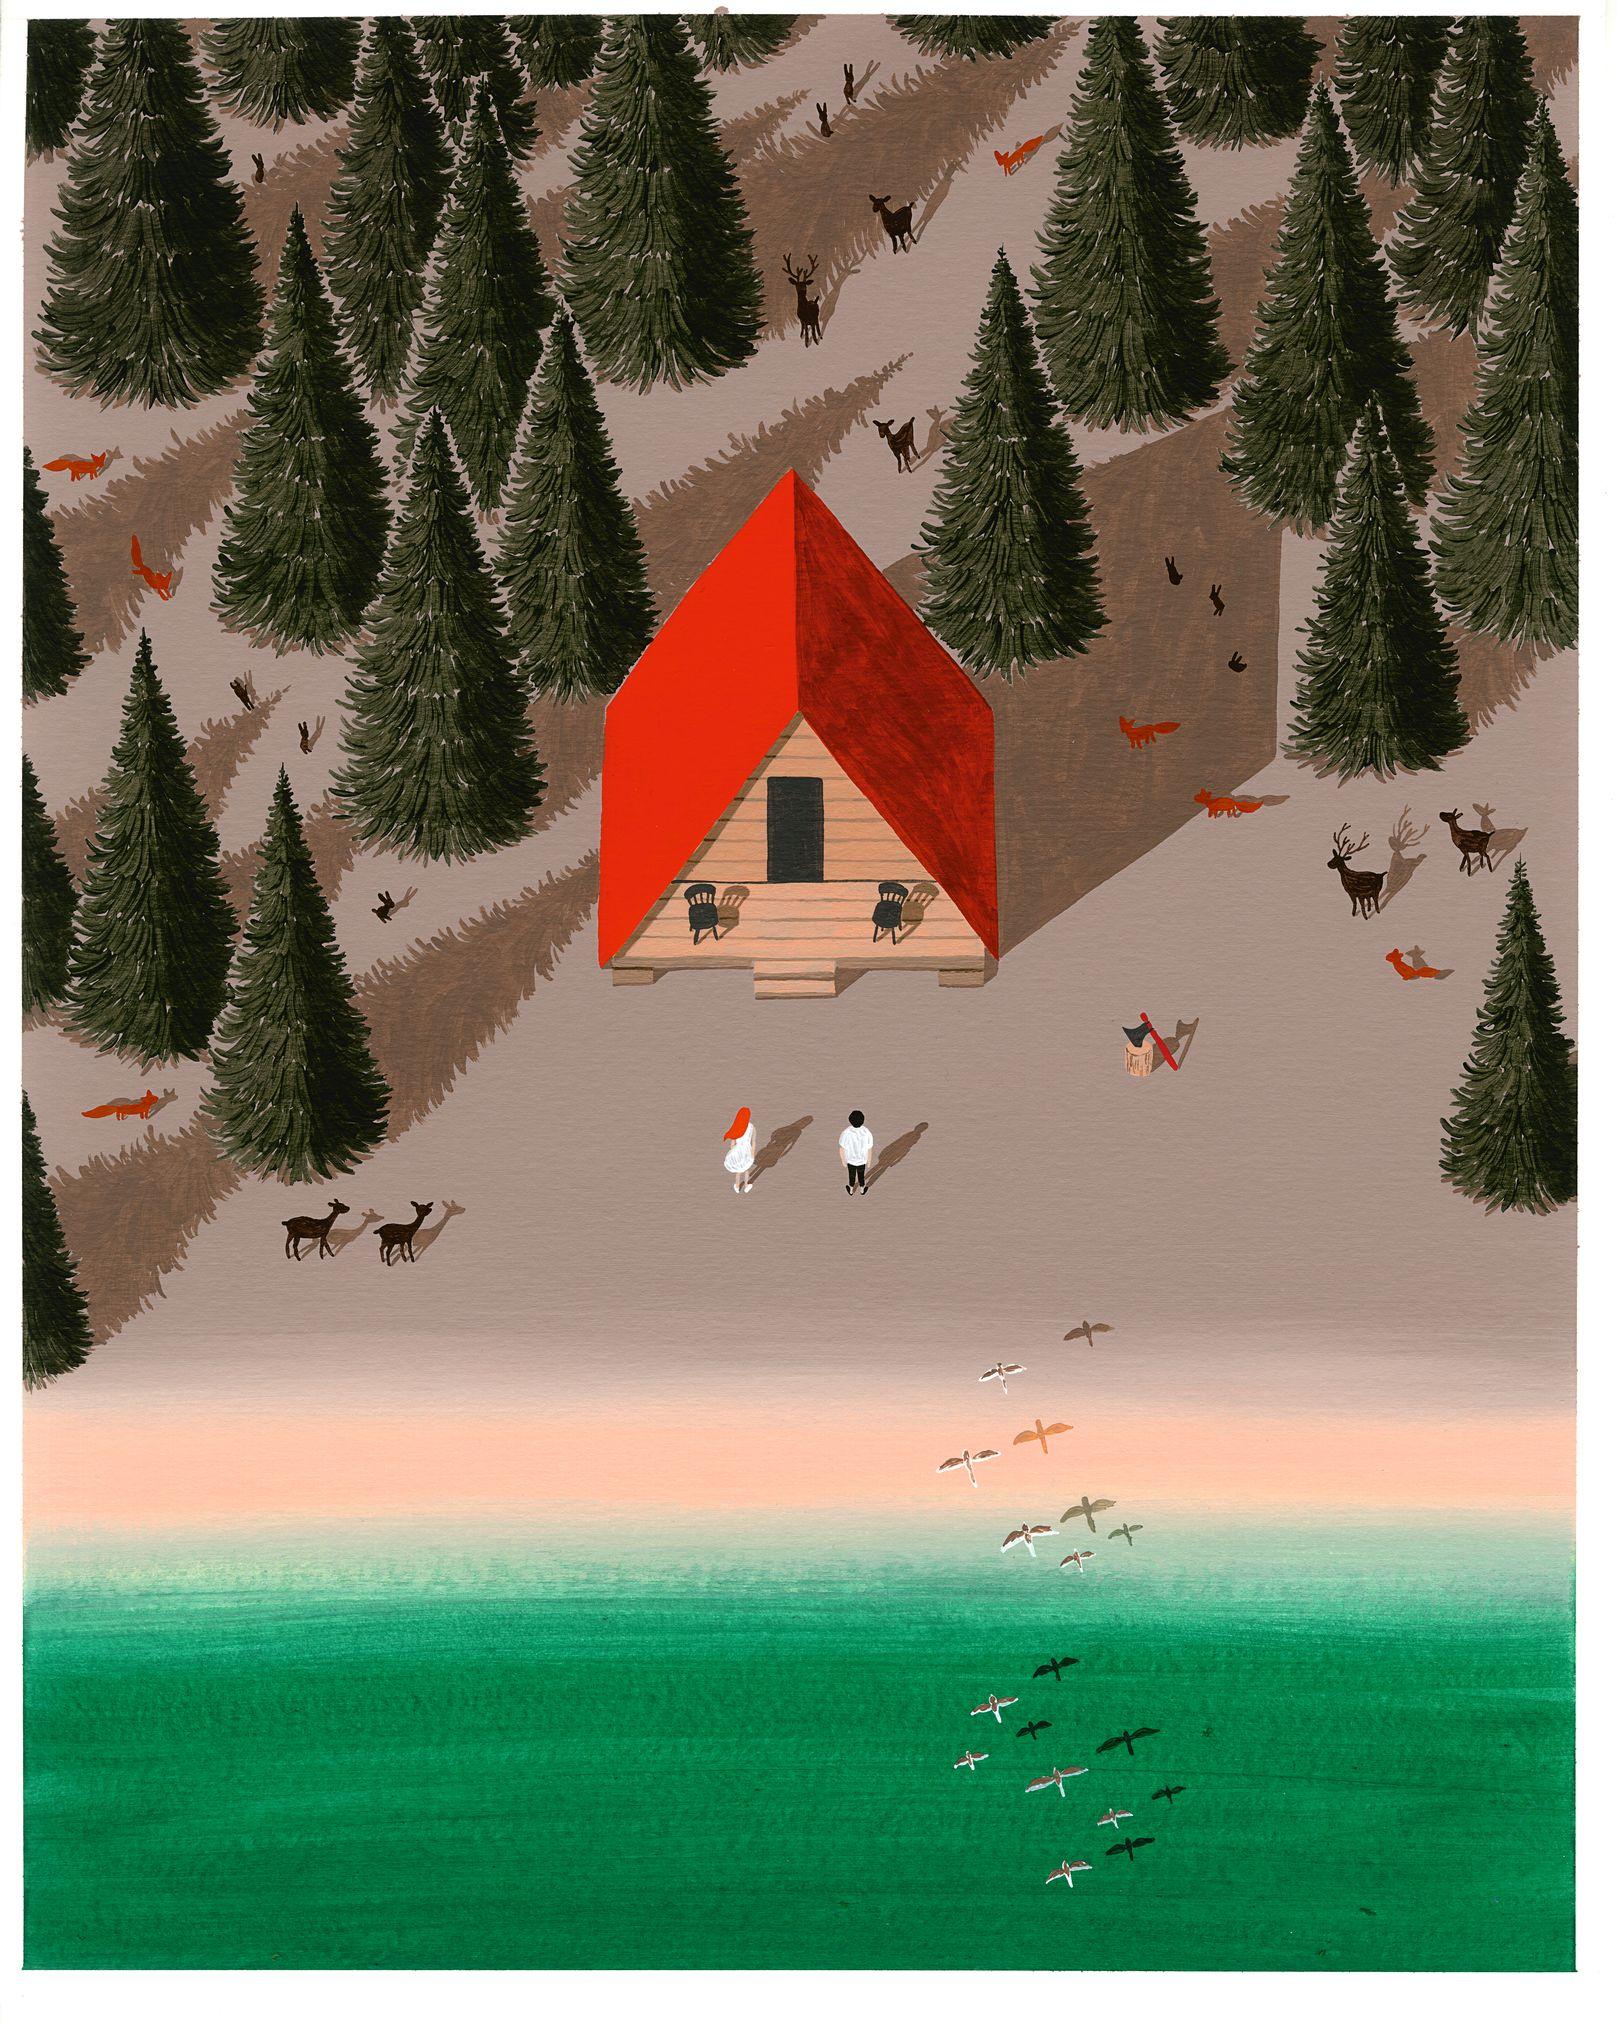 garance-illustration-yukiko-noritake-The-Brothers-Forest2